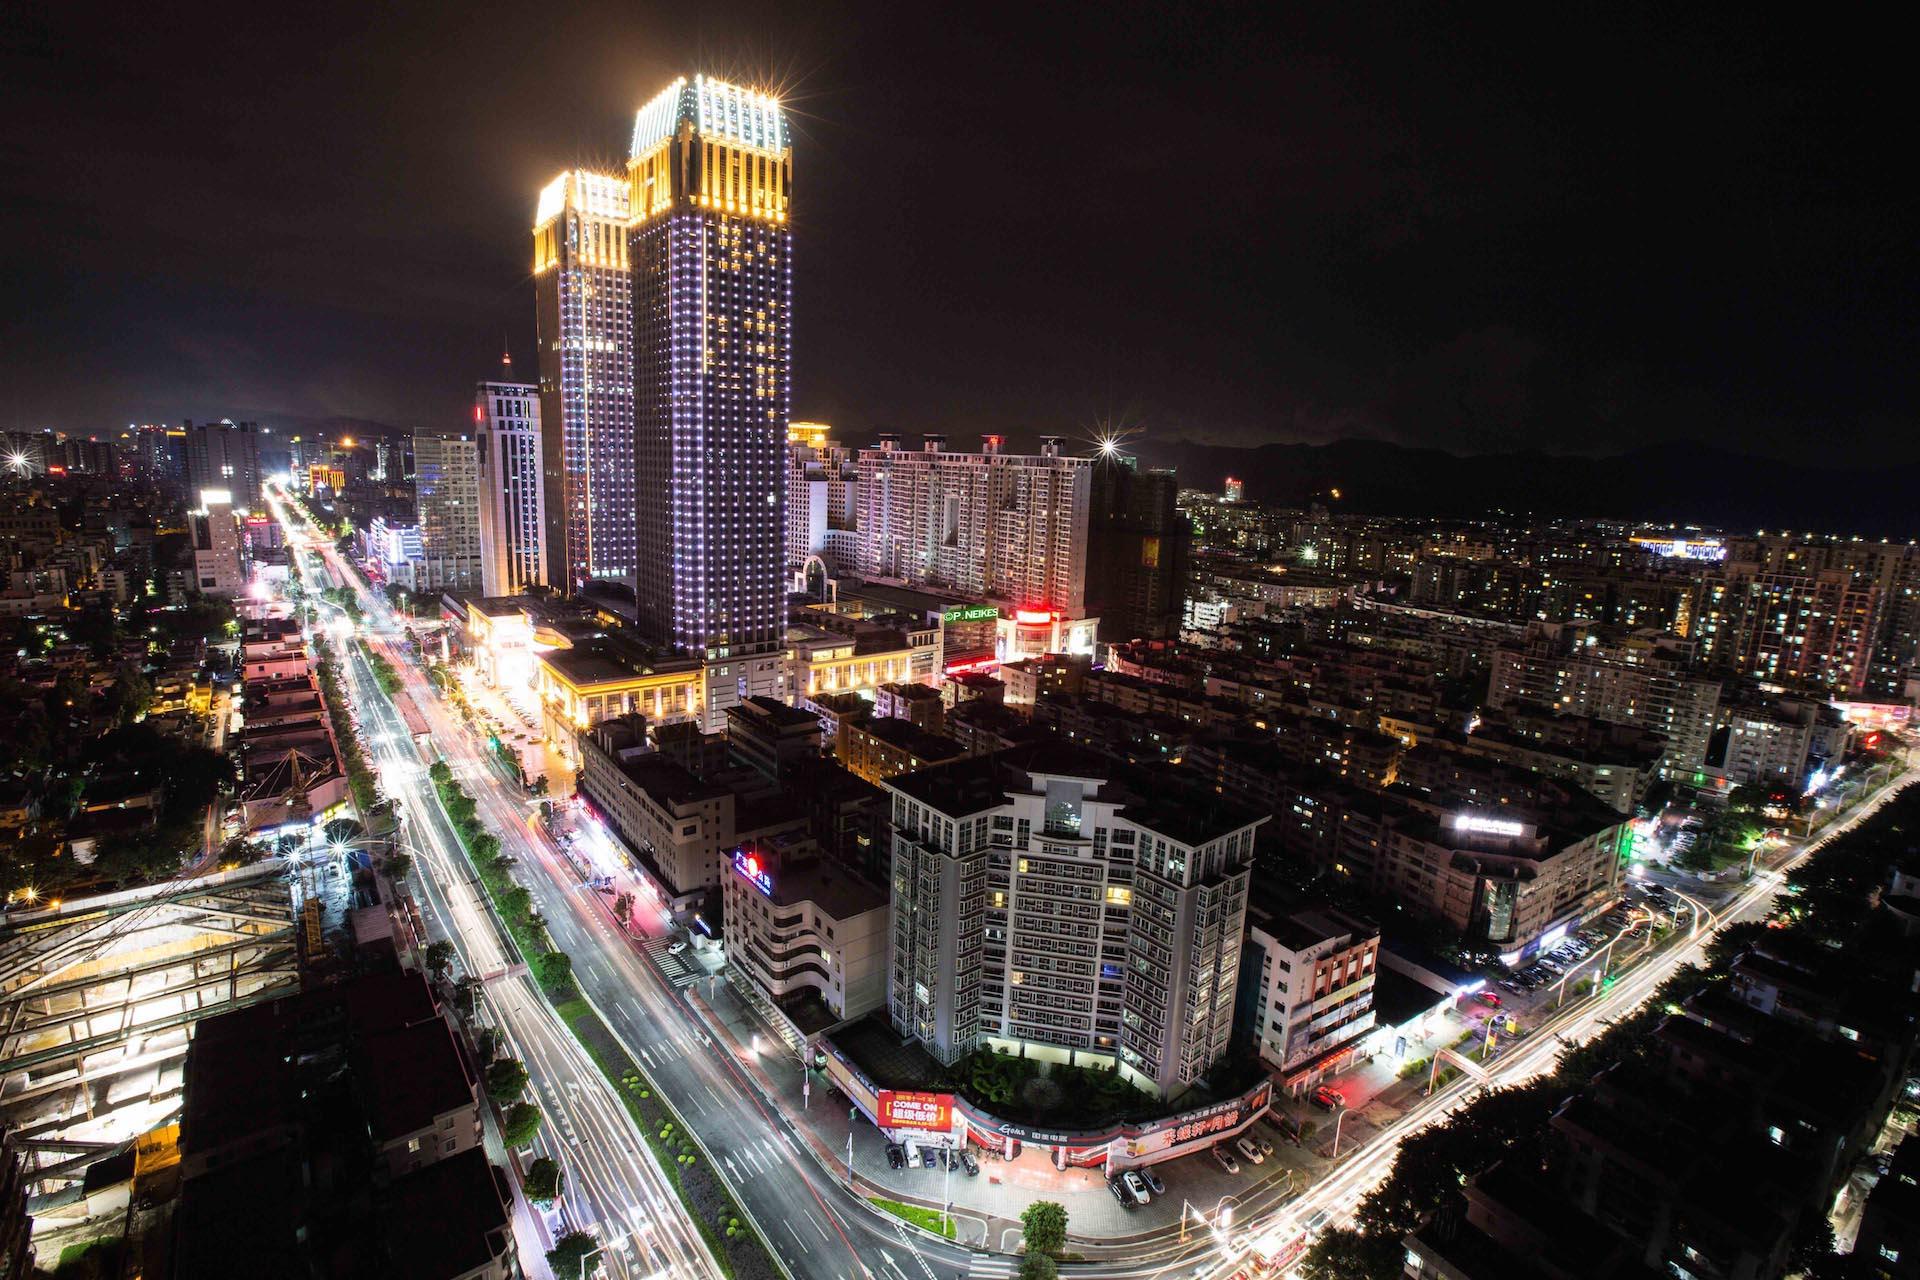 Zhongshan City - Hilton Hotel & LiHe Shopping district